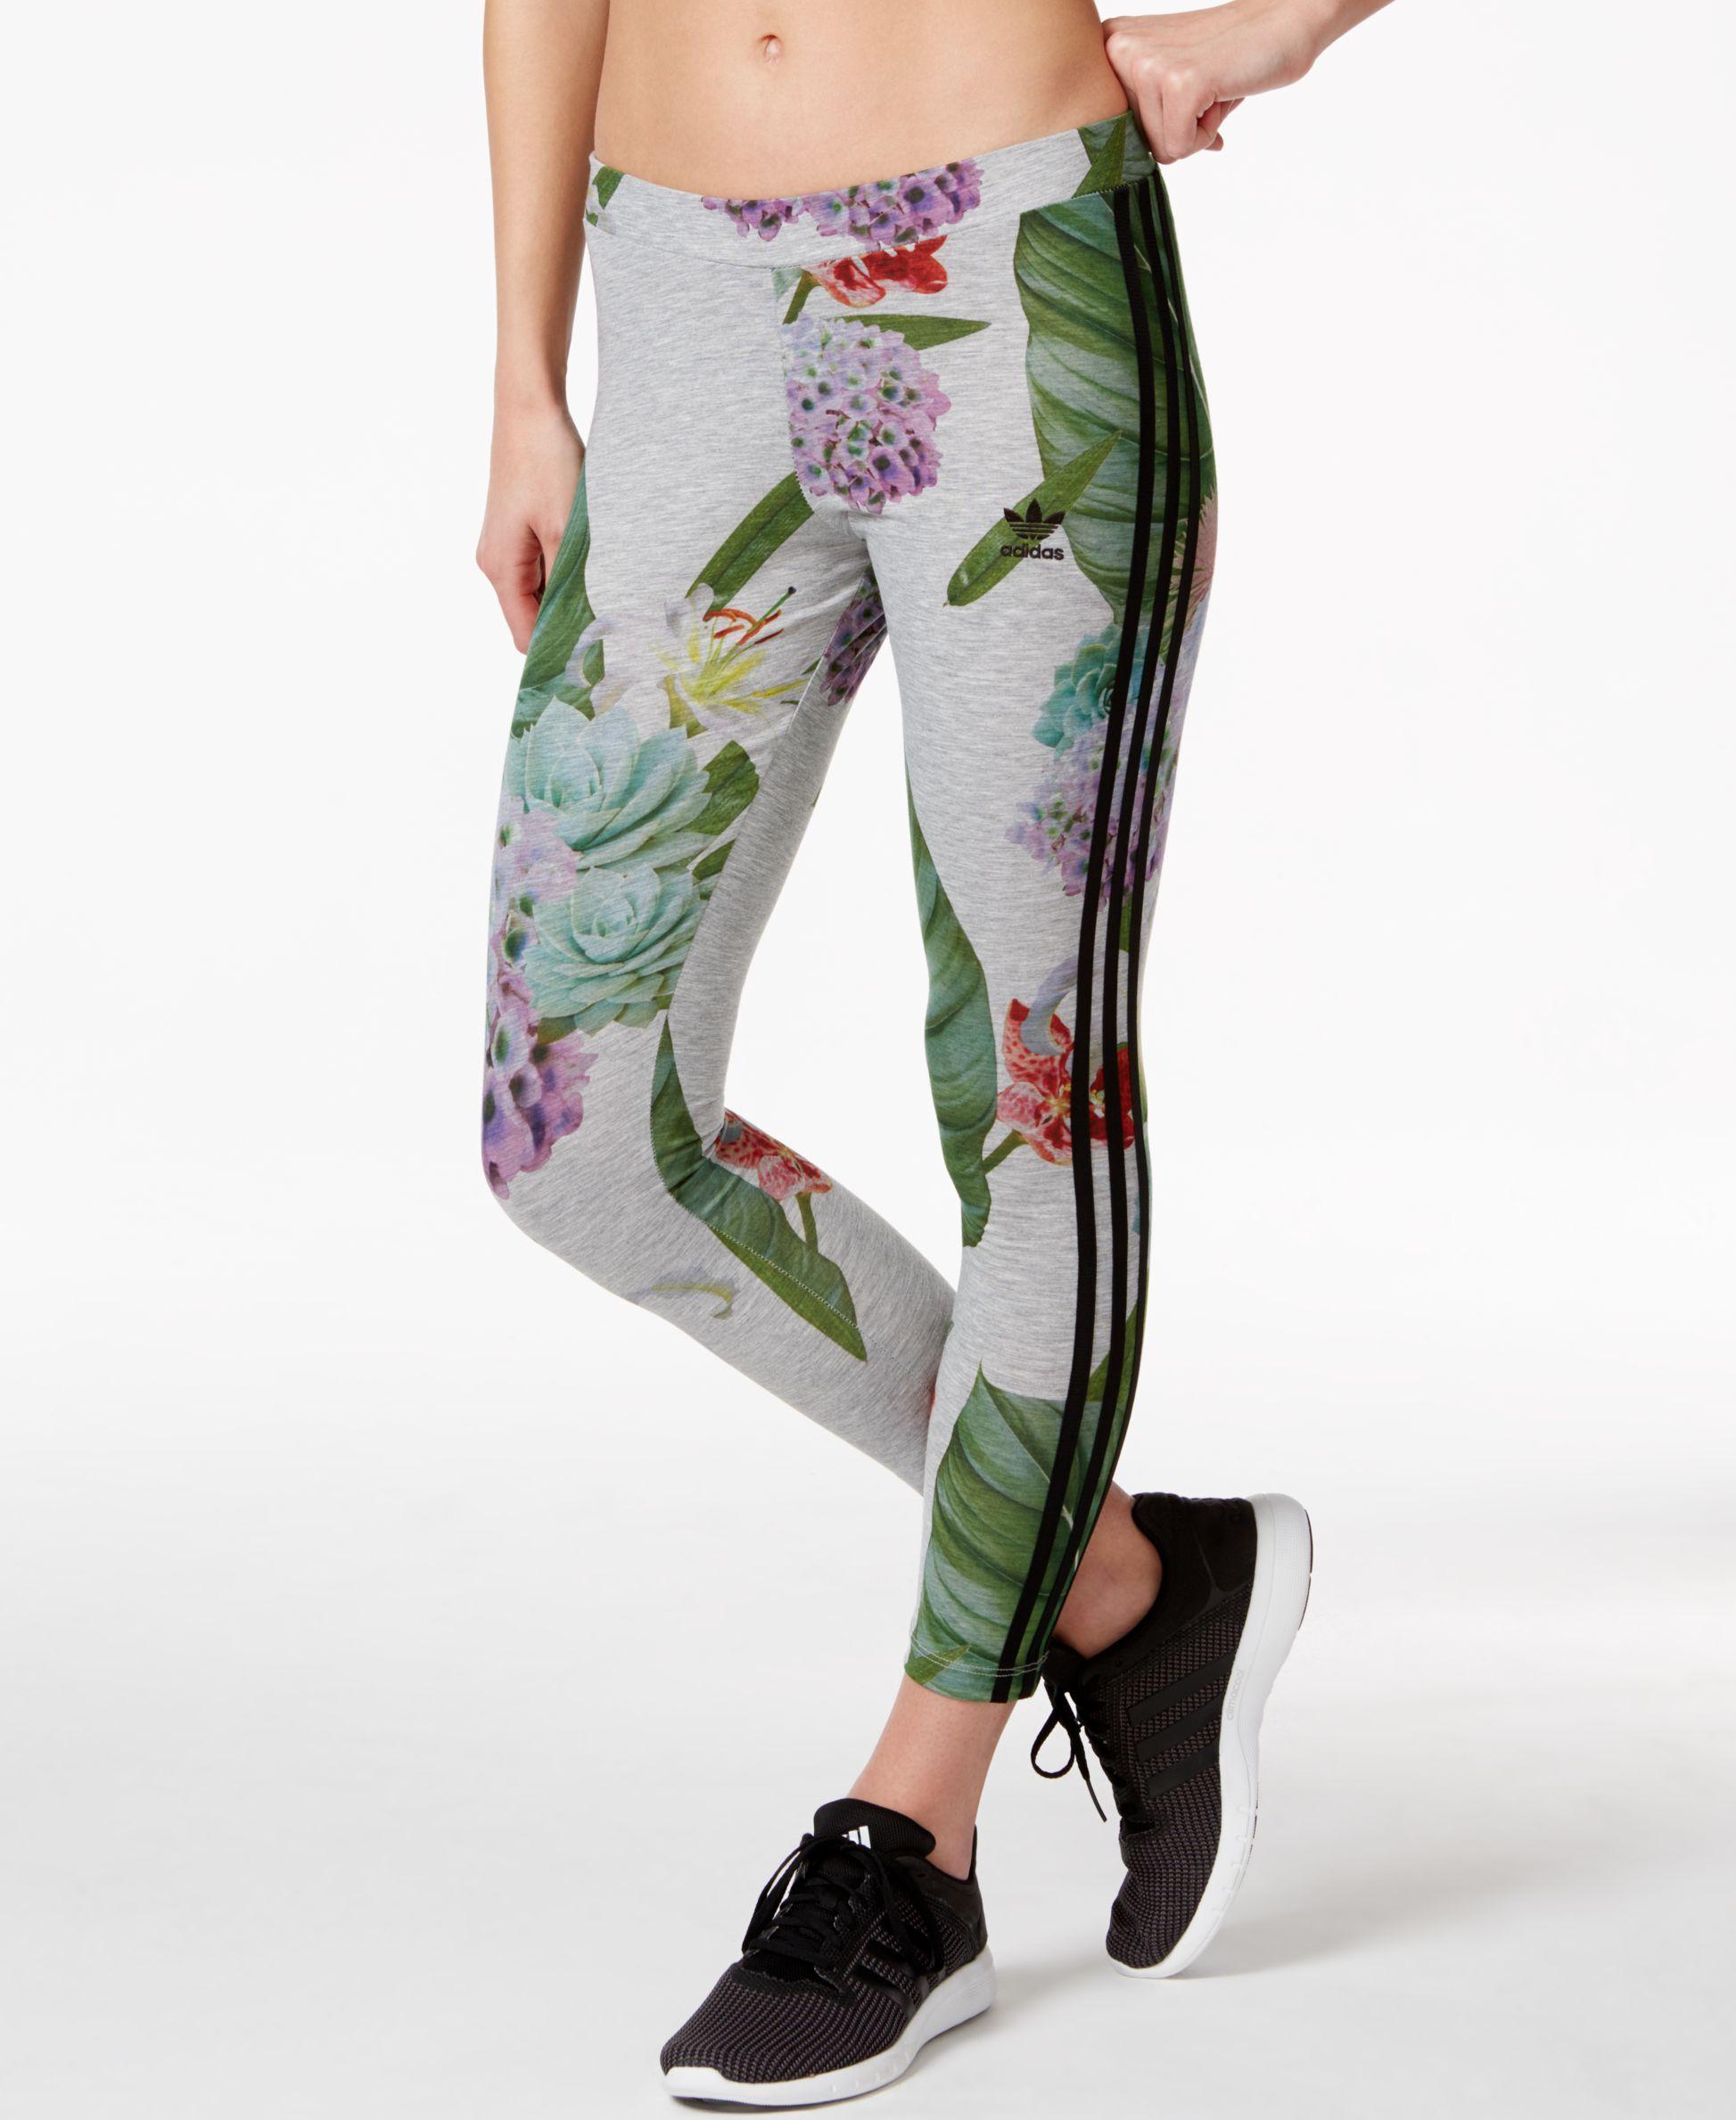 09fe634245 adidas Originals Floral-Print Leggings | Gym Style in 2019 | Floral ...